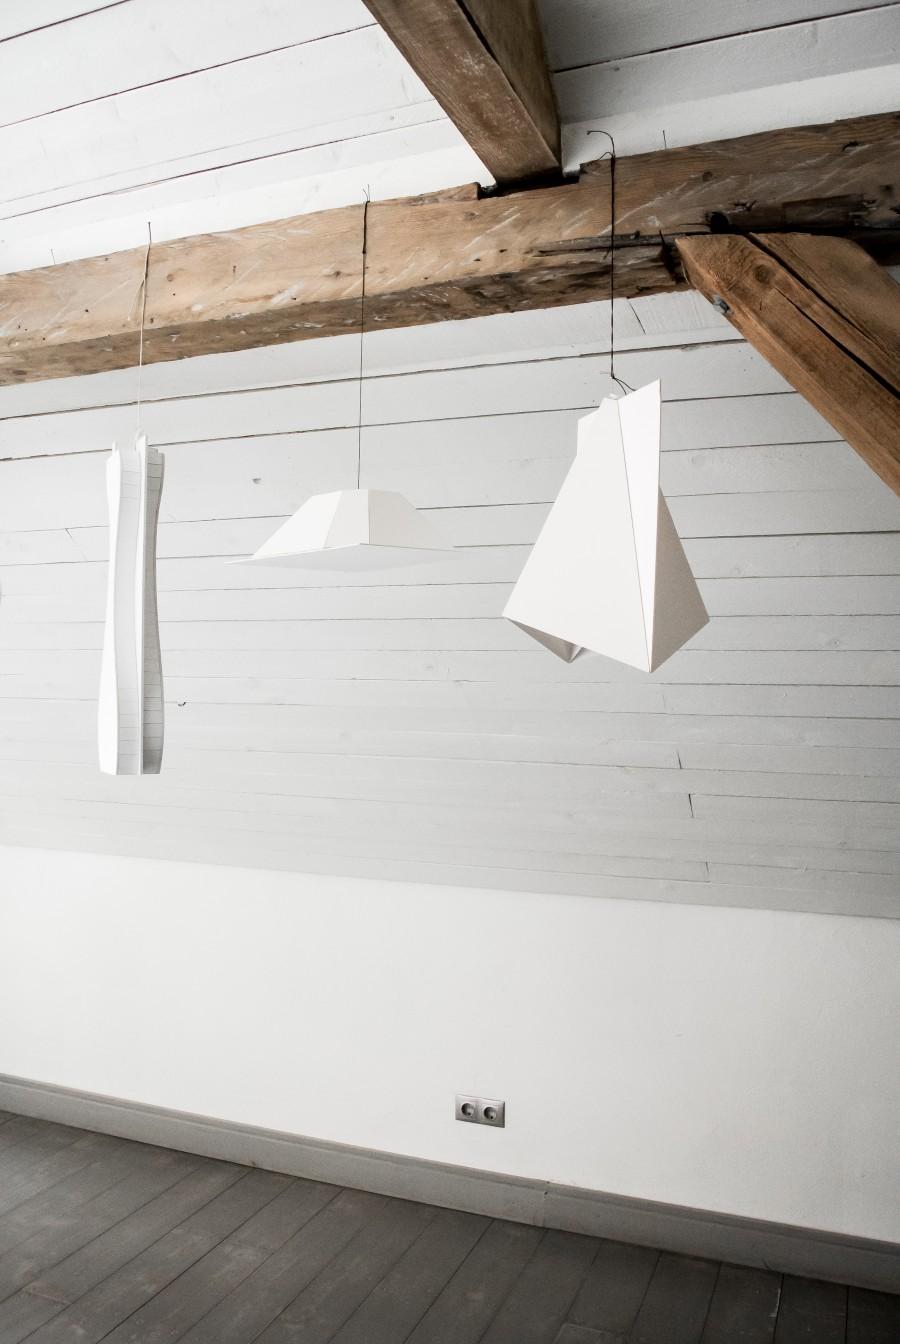 IKEA-ARTSCHOOL-108-e1499173780826.jpg